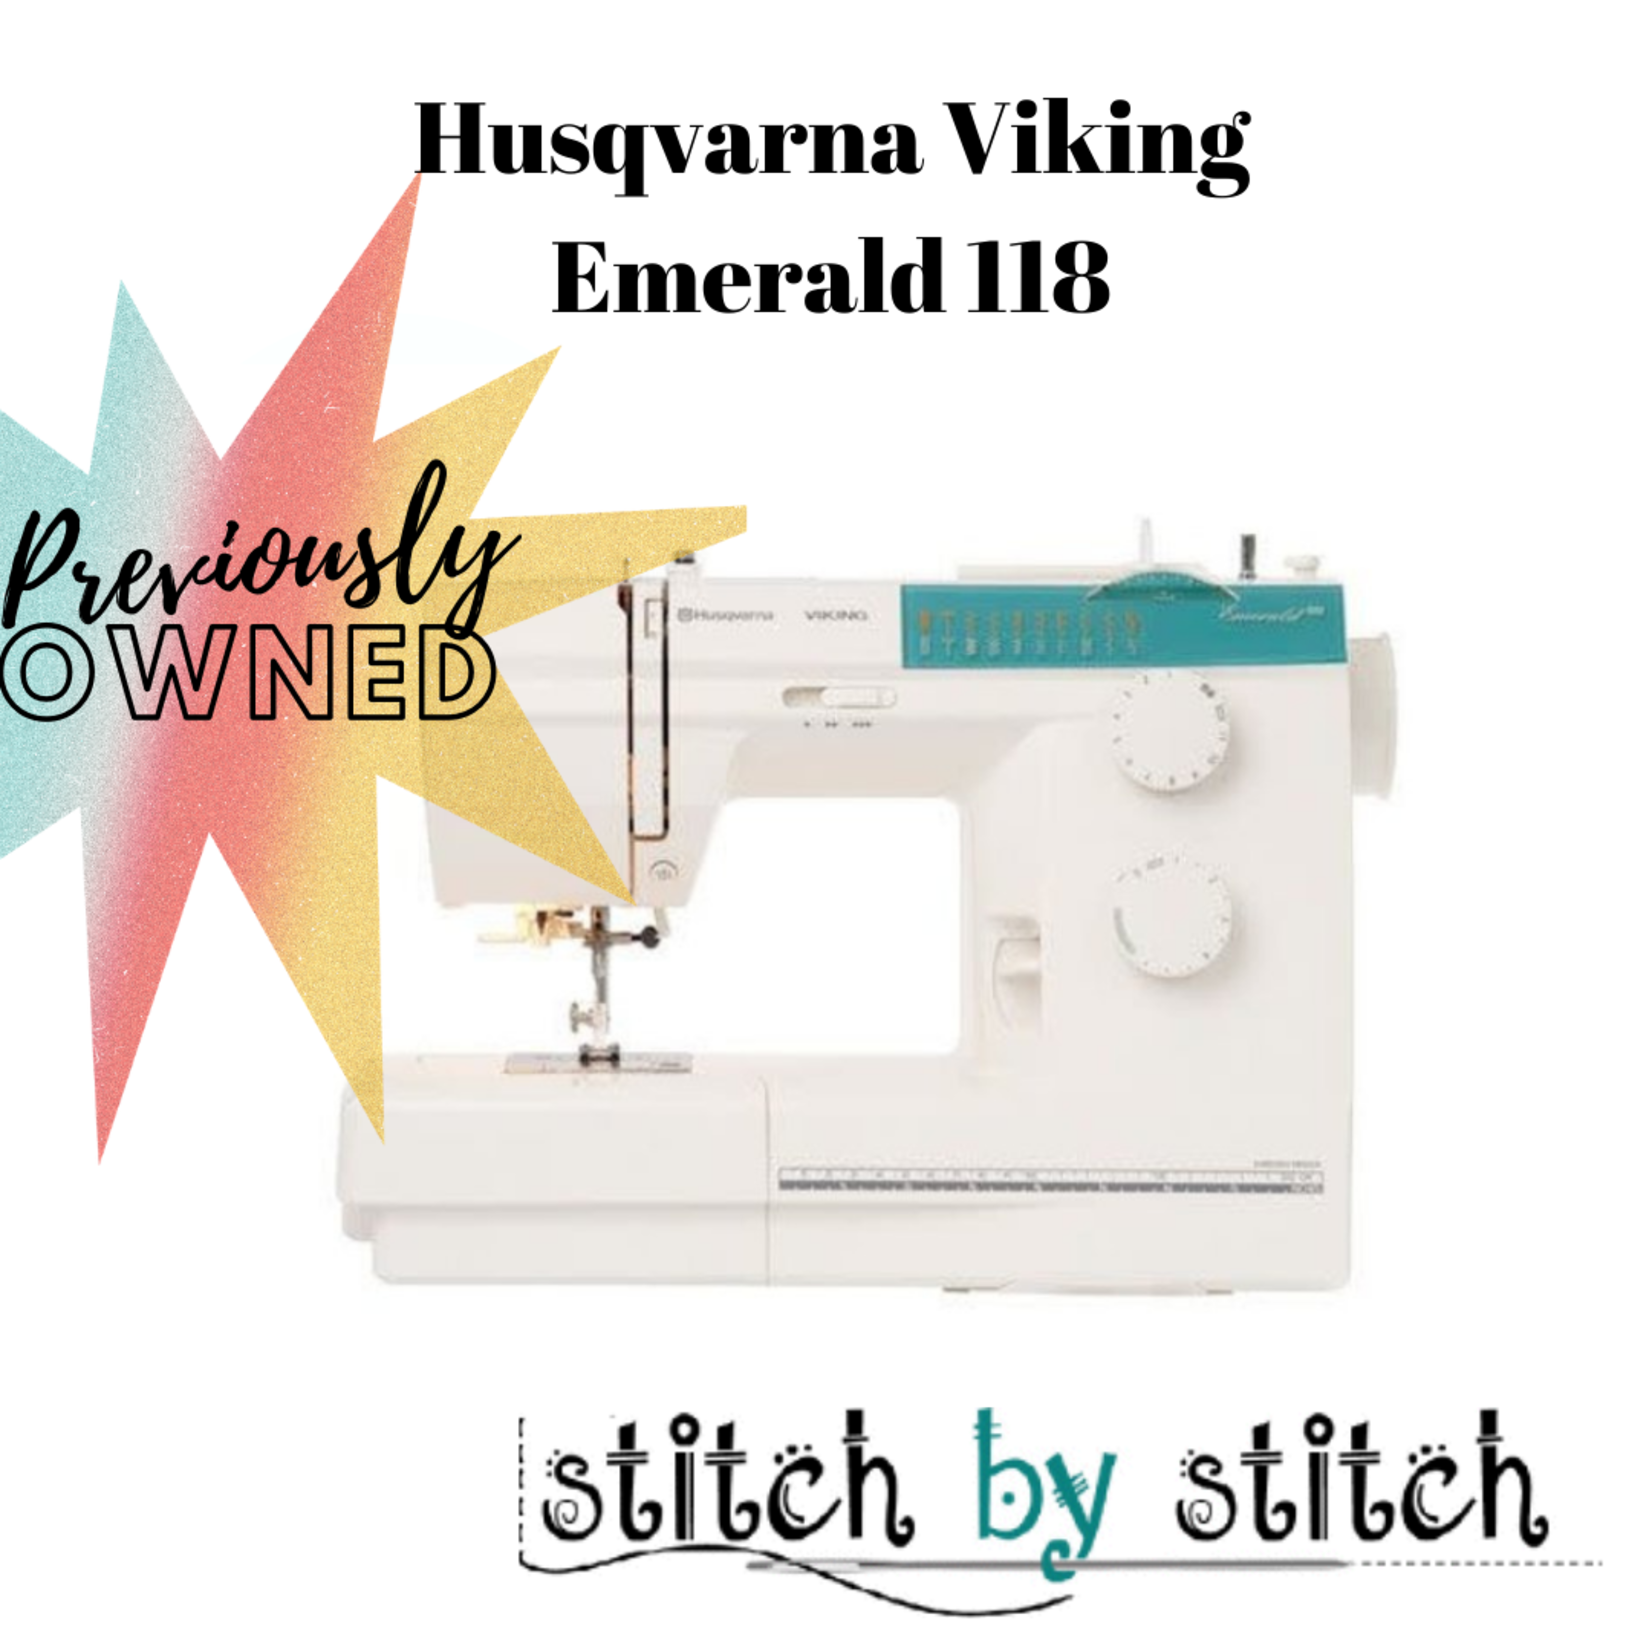 HUSQVARNA VIKING EMERALD™ 118 - previously owned